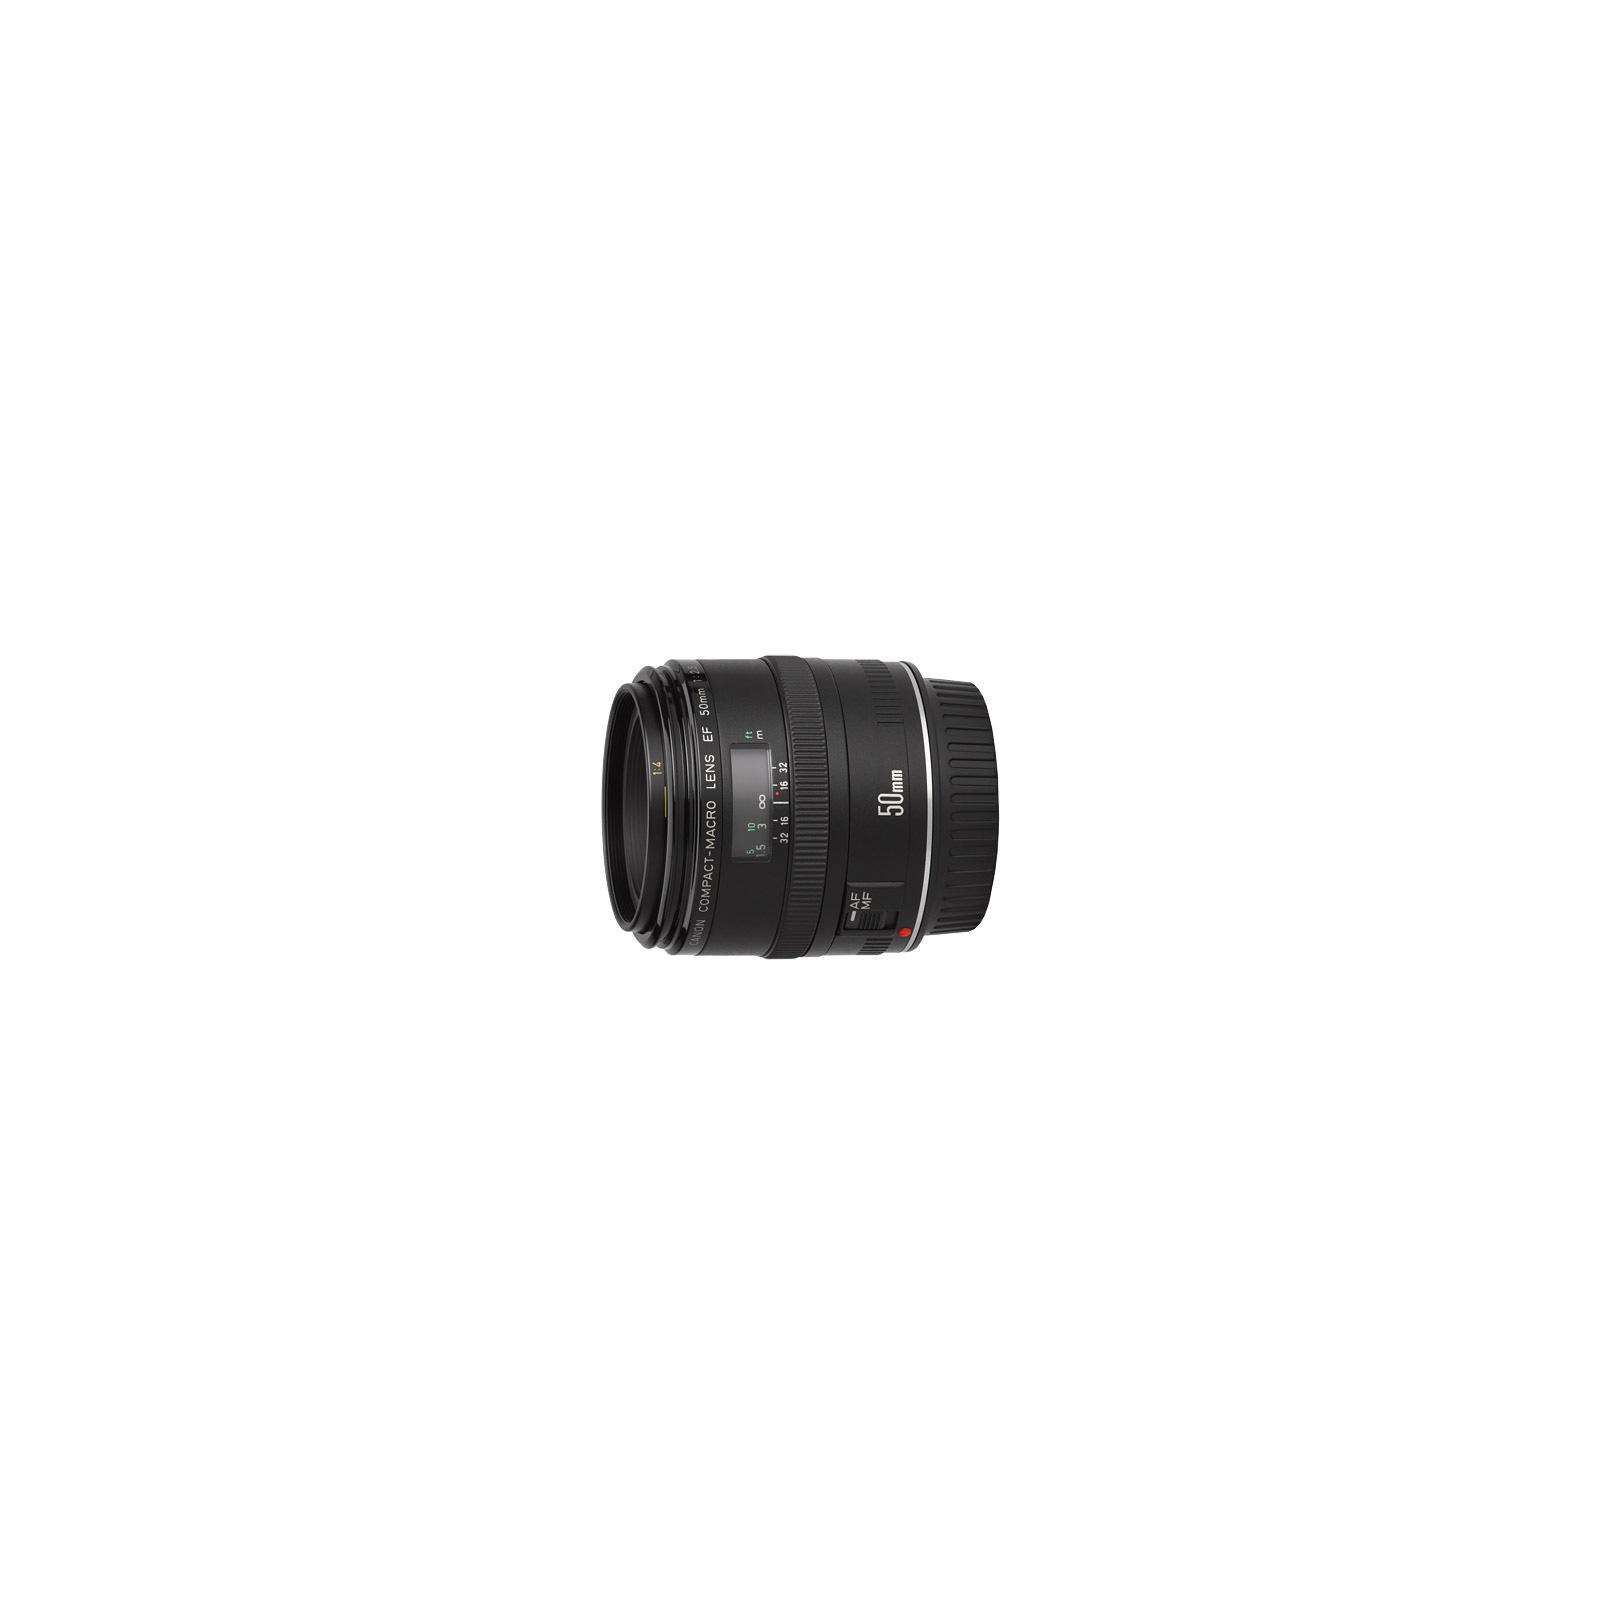 Объектив Canon EF 50mm f/2.5 Macro (2537A012)